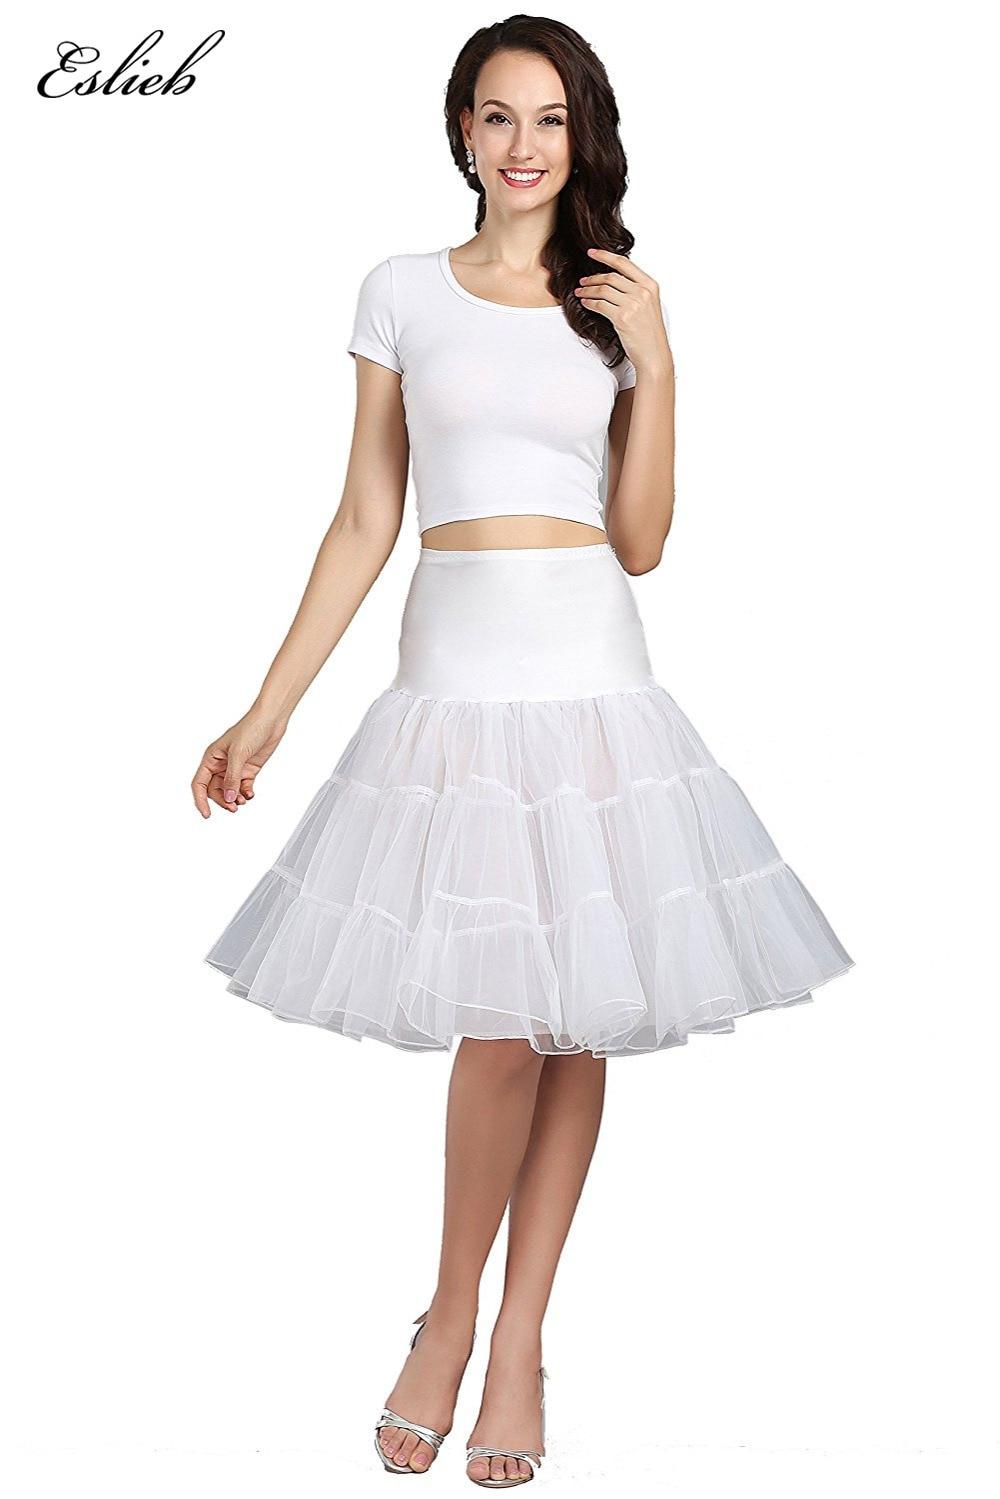 Eslieb Free Short Organza Petticoat Crinoline Vintage ...